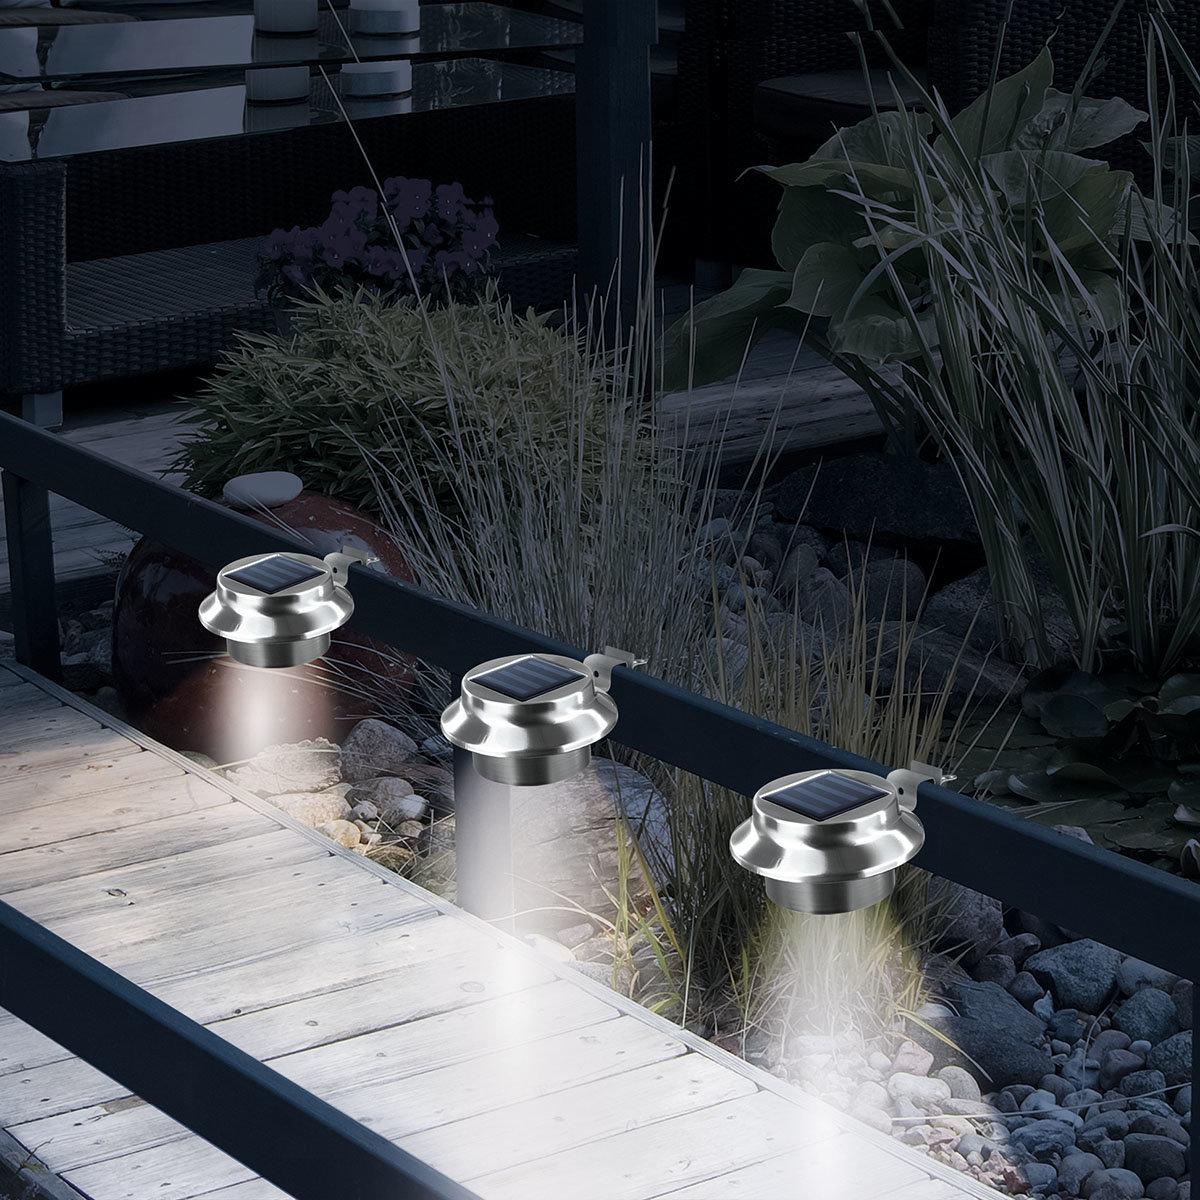 Solarzauber Dachrinnen-Leuchten, 3er-Set, Edelstahl | #3